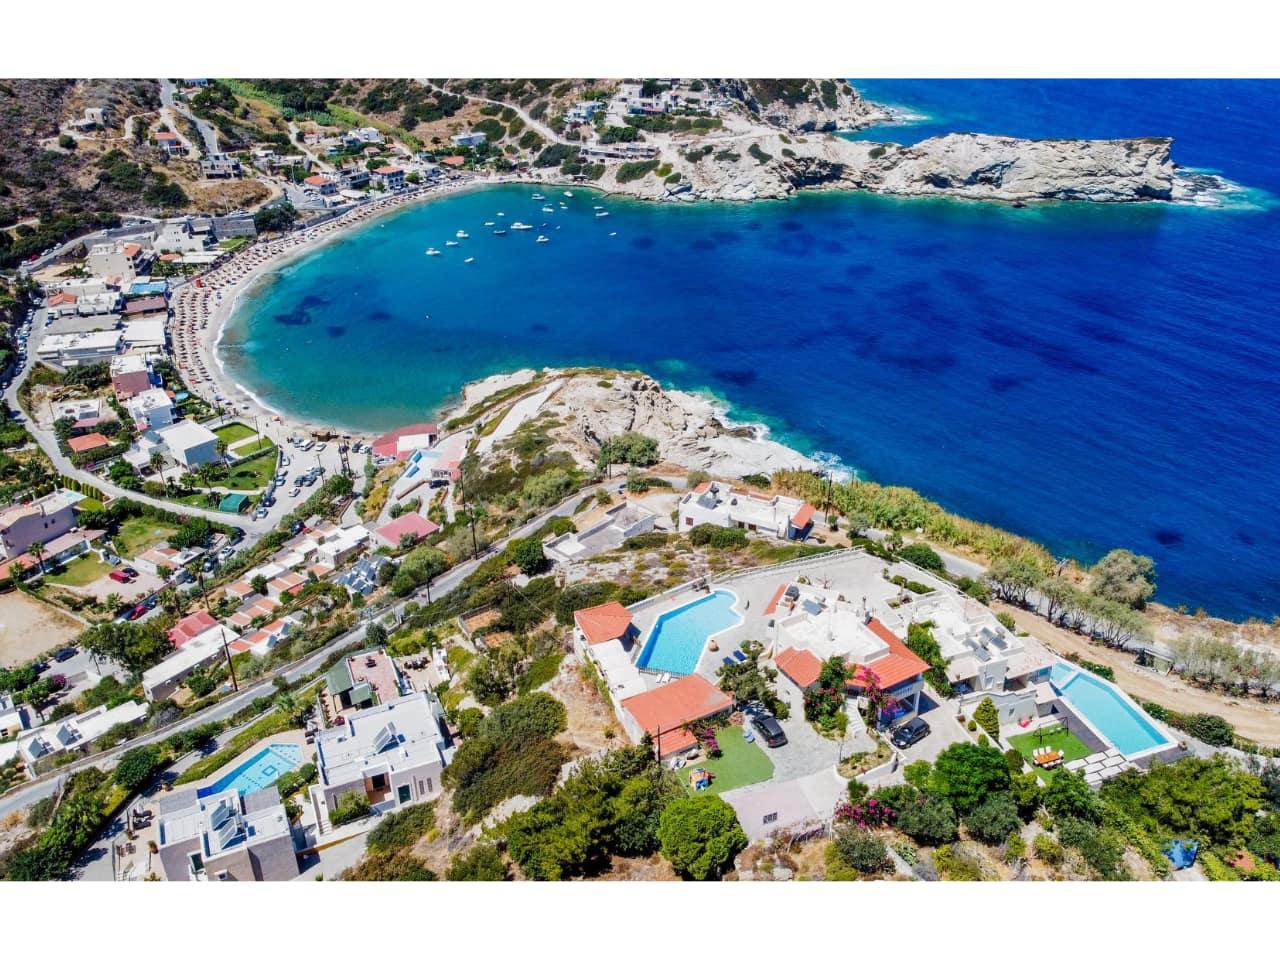 Ligaria beach, Lygaria or Ligaria beach heraklion crete